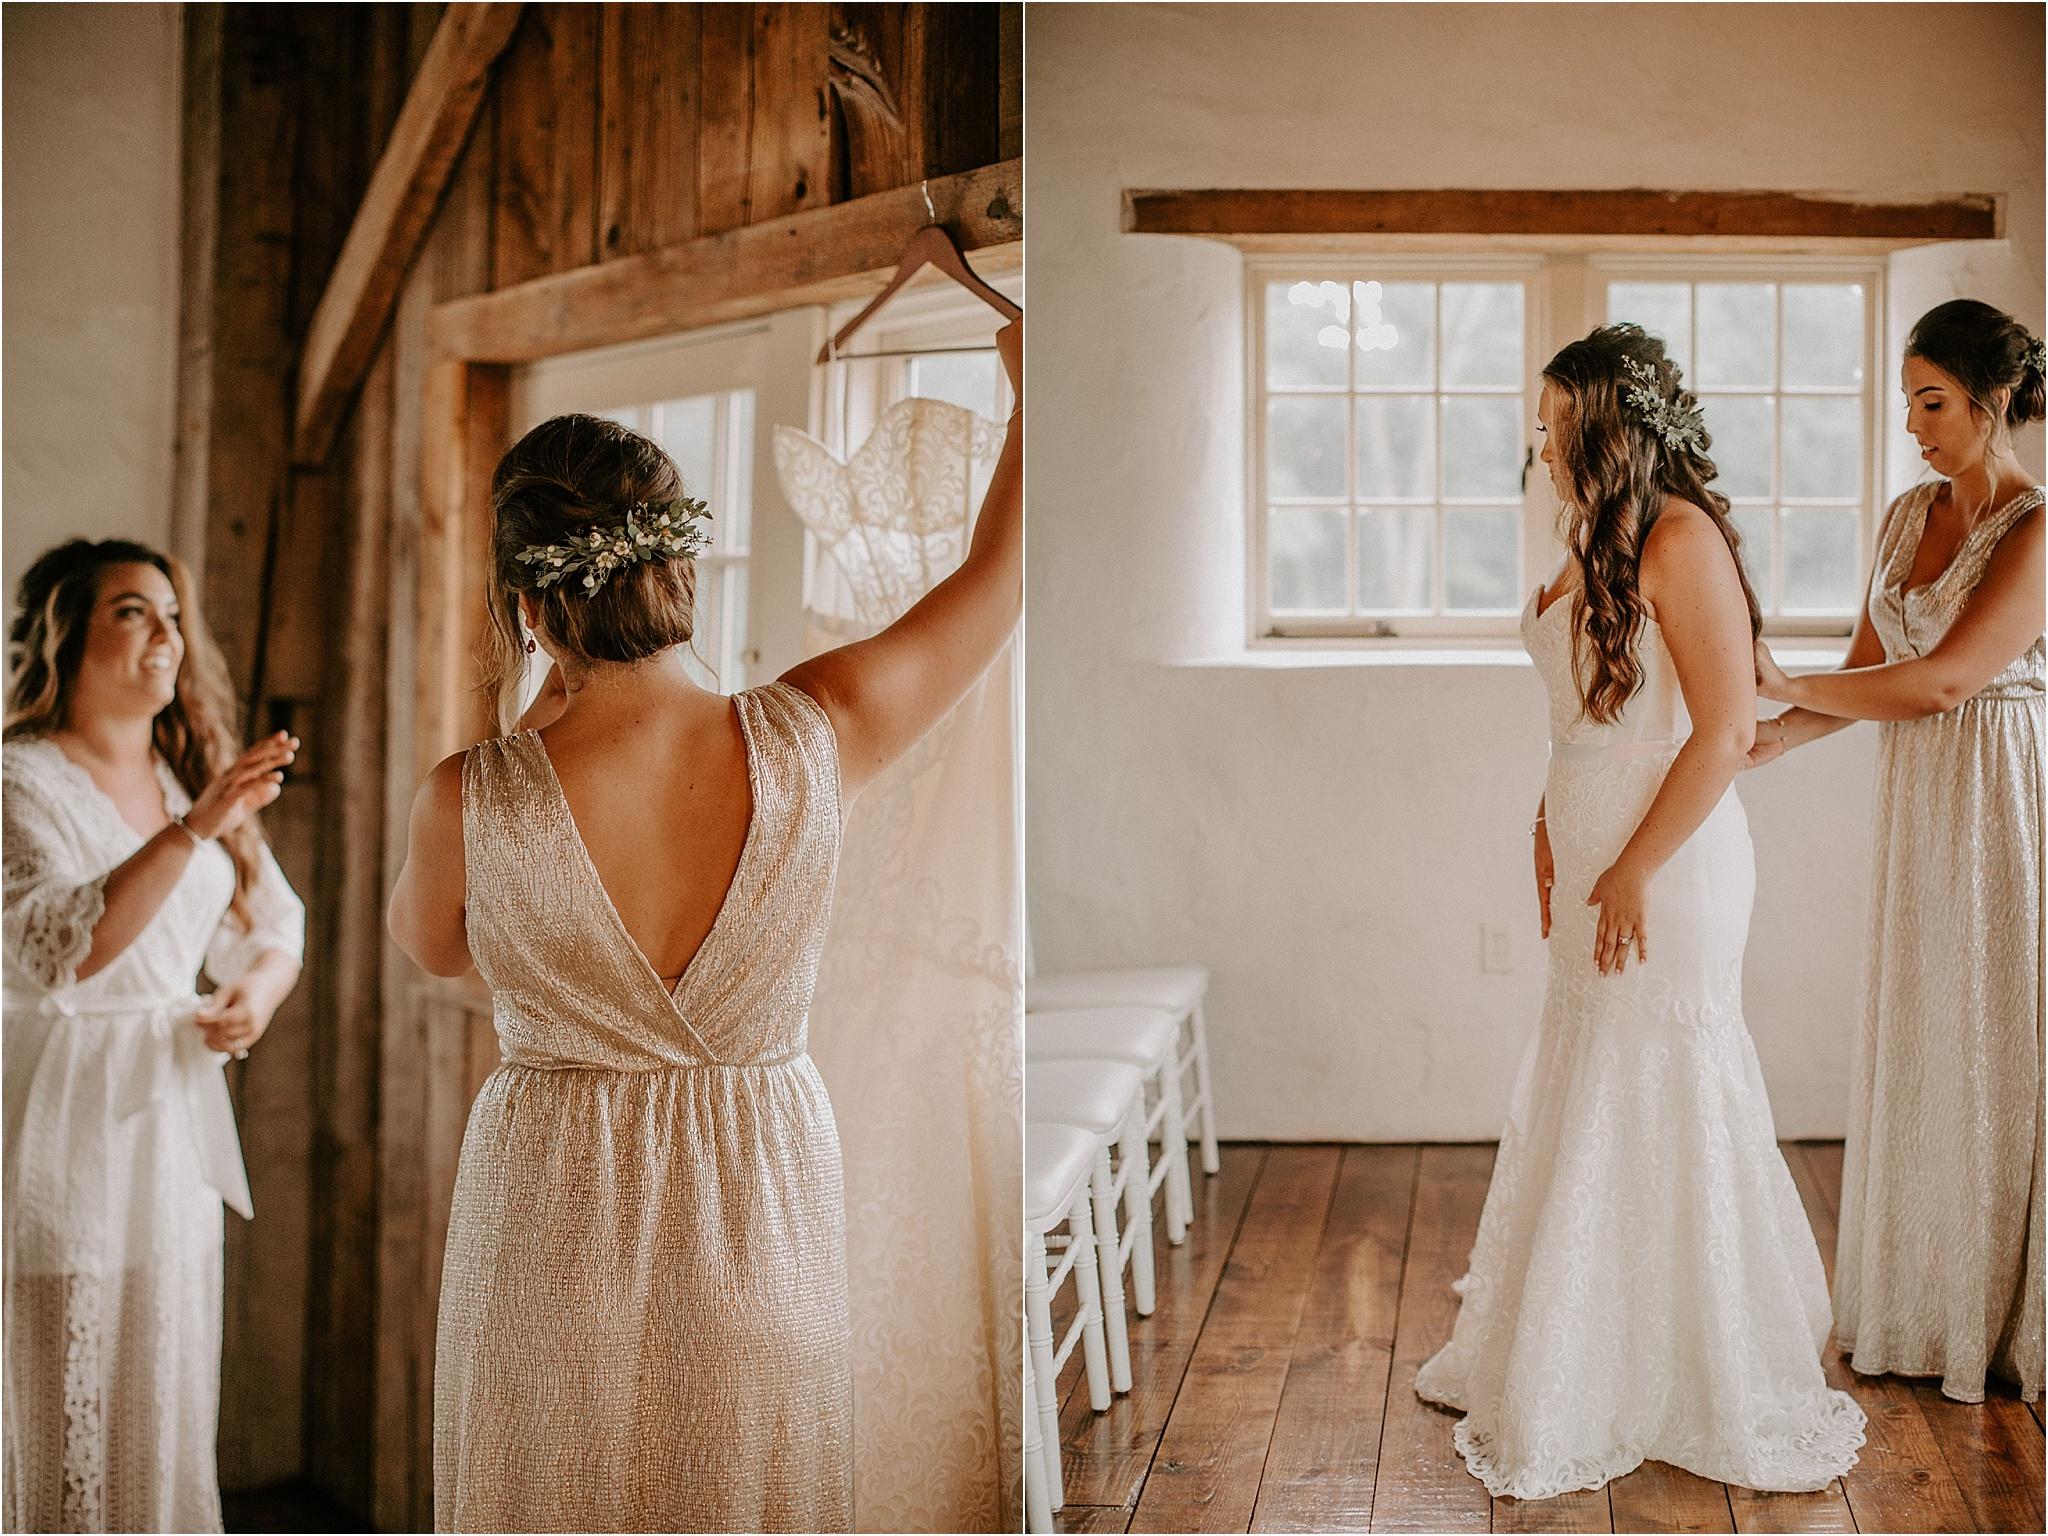 Sarah_Brookhart_Philadelphia_Wedding_Photographer_0007-1.jpg